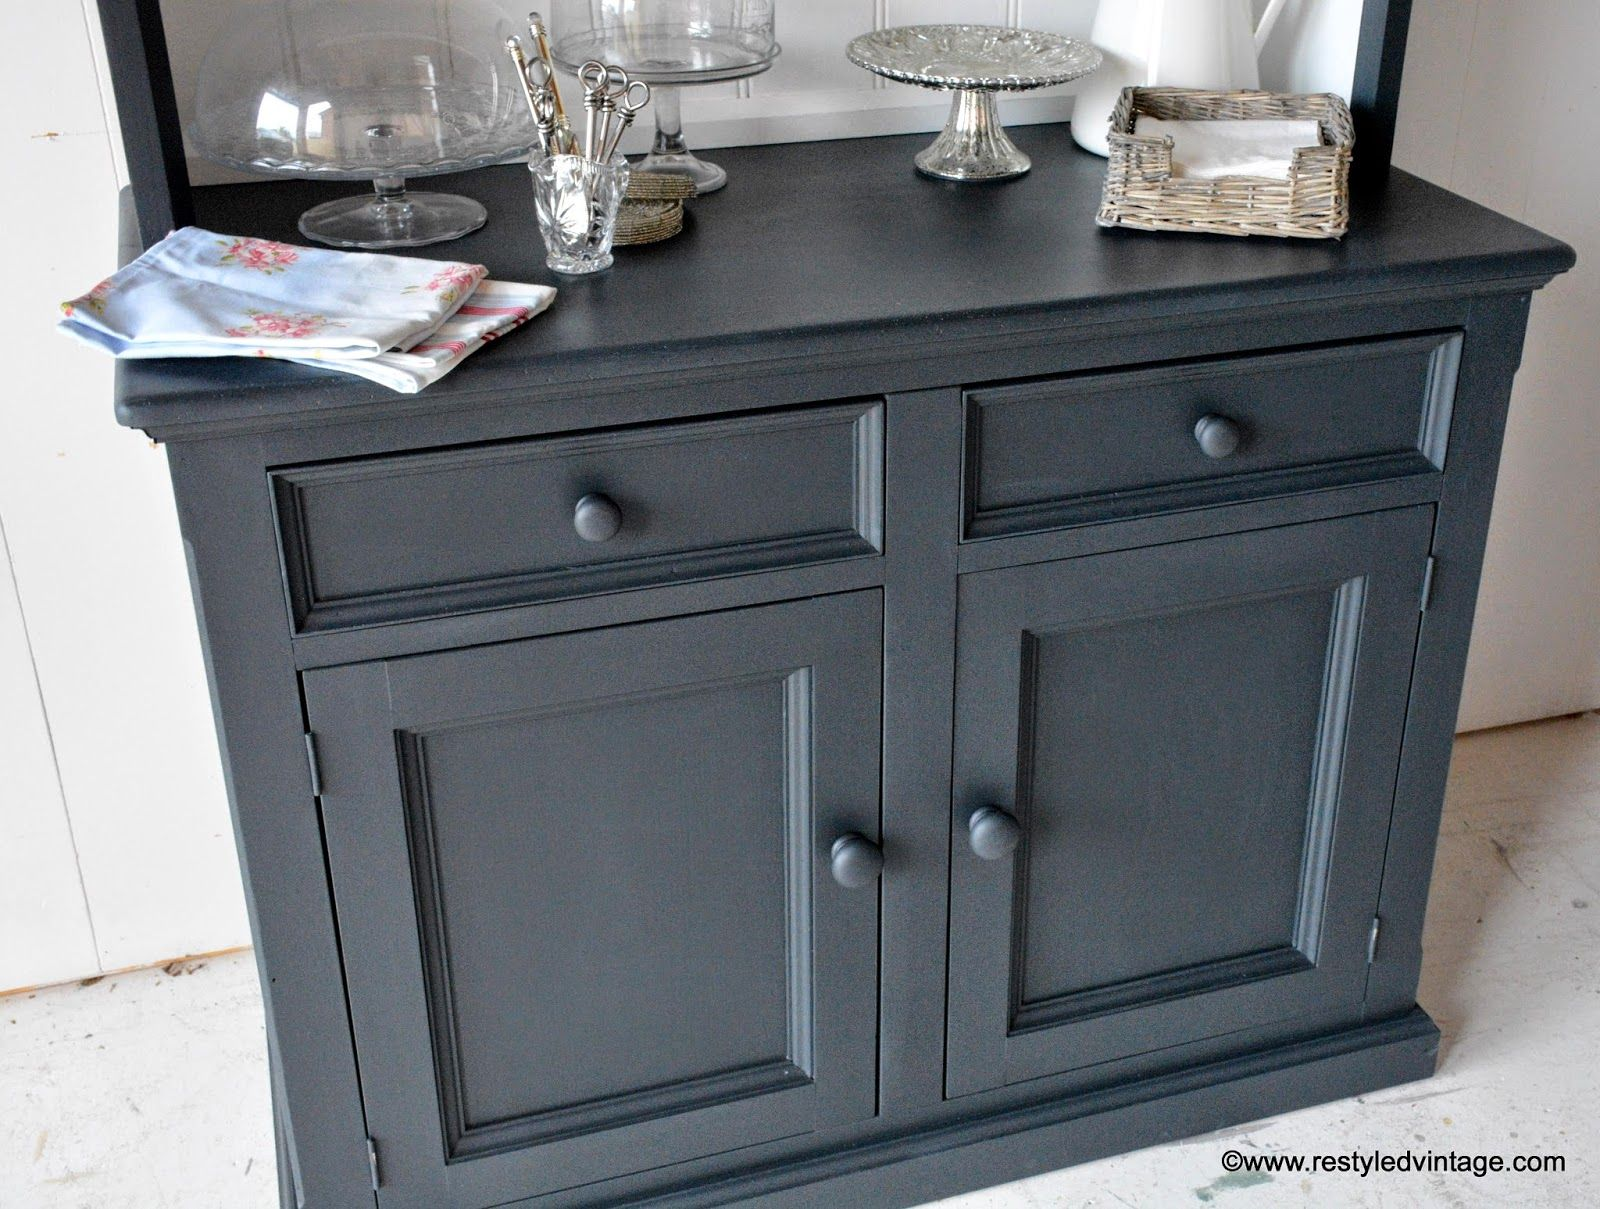 annie sloan chalk paint in graphite home dec pinterest annie sloan chalk paint annie. Black Bedroom Furniture Sets. Home Design Ideas